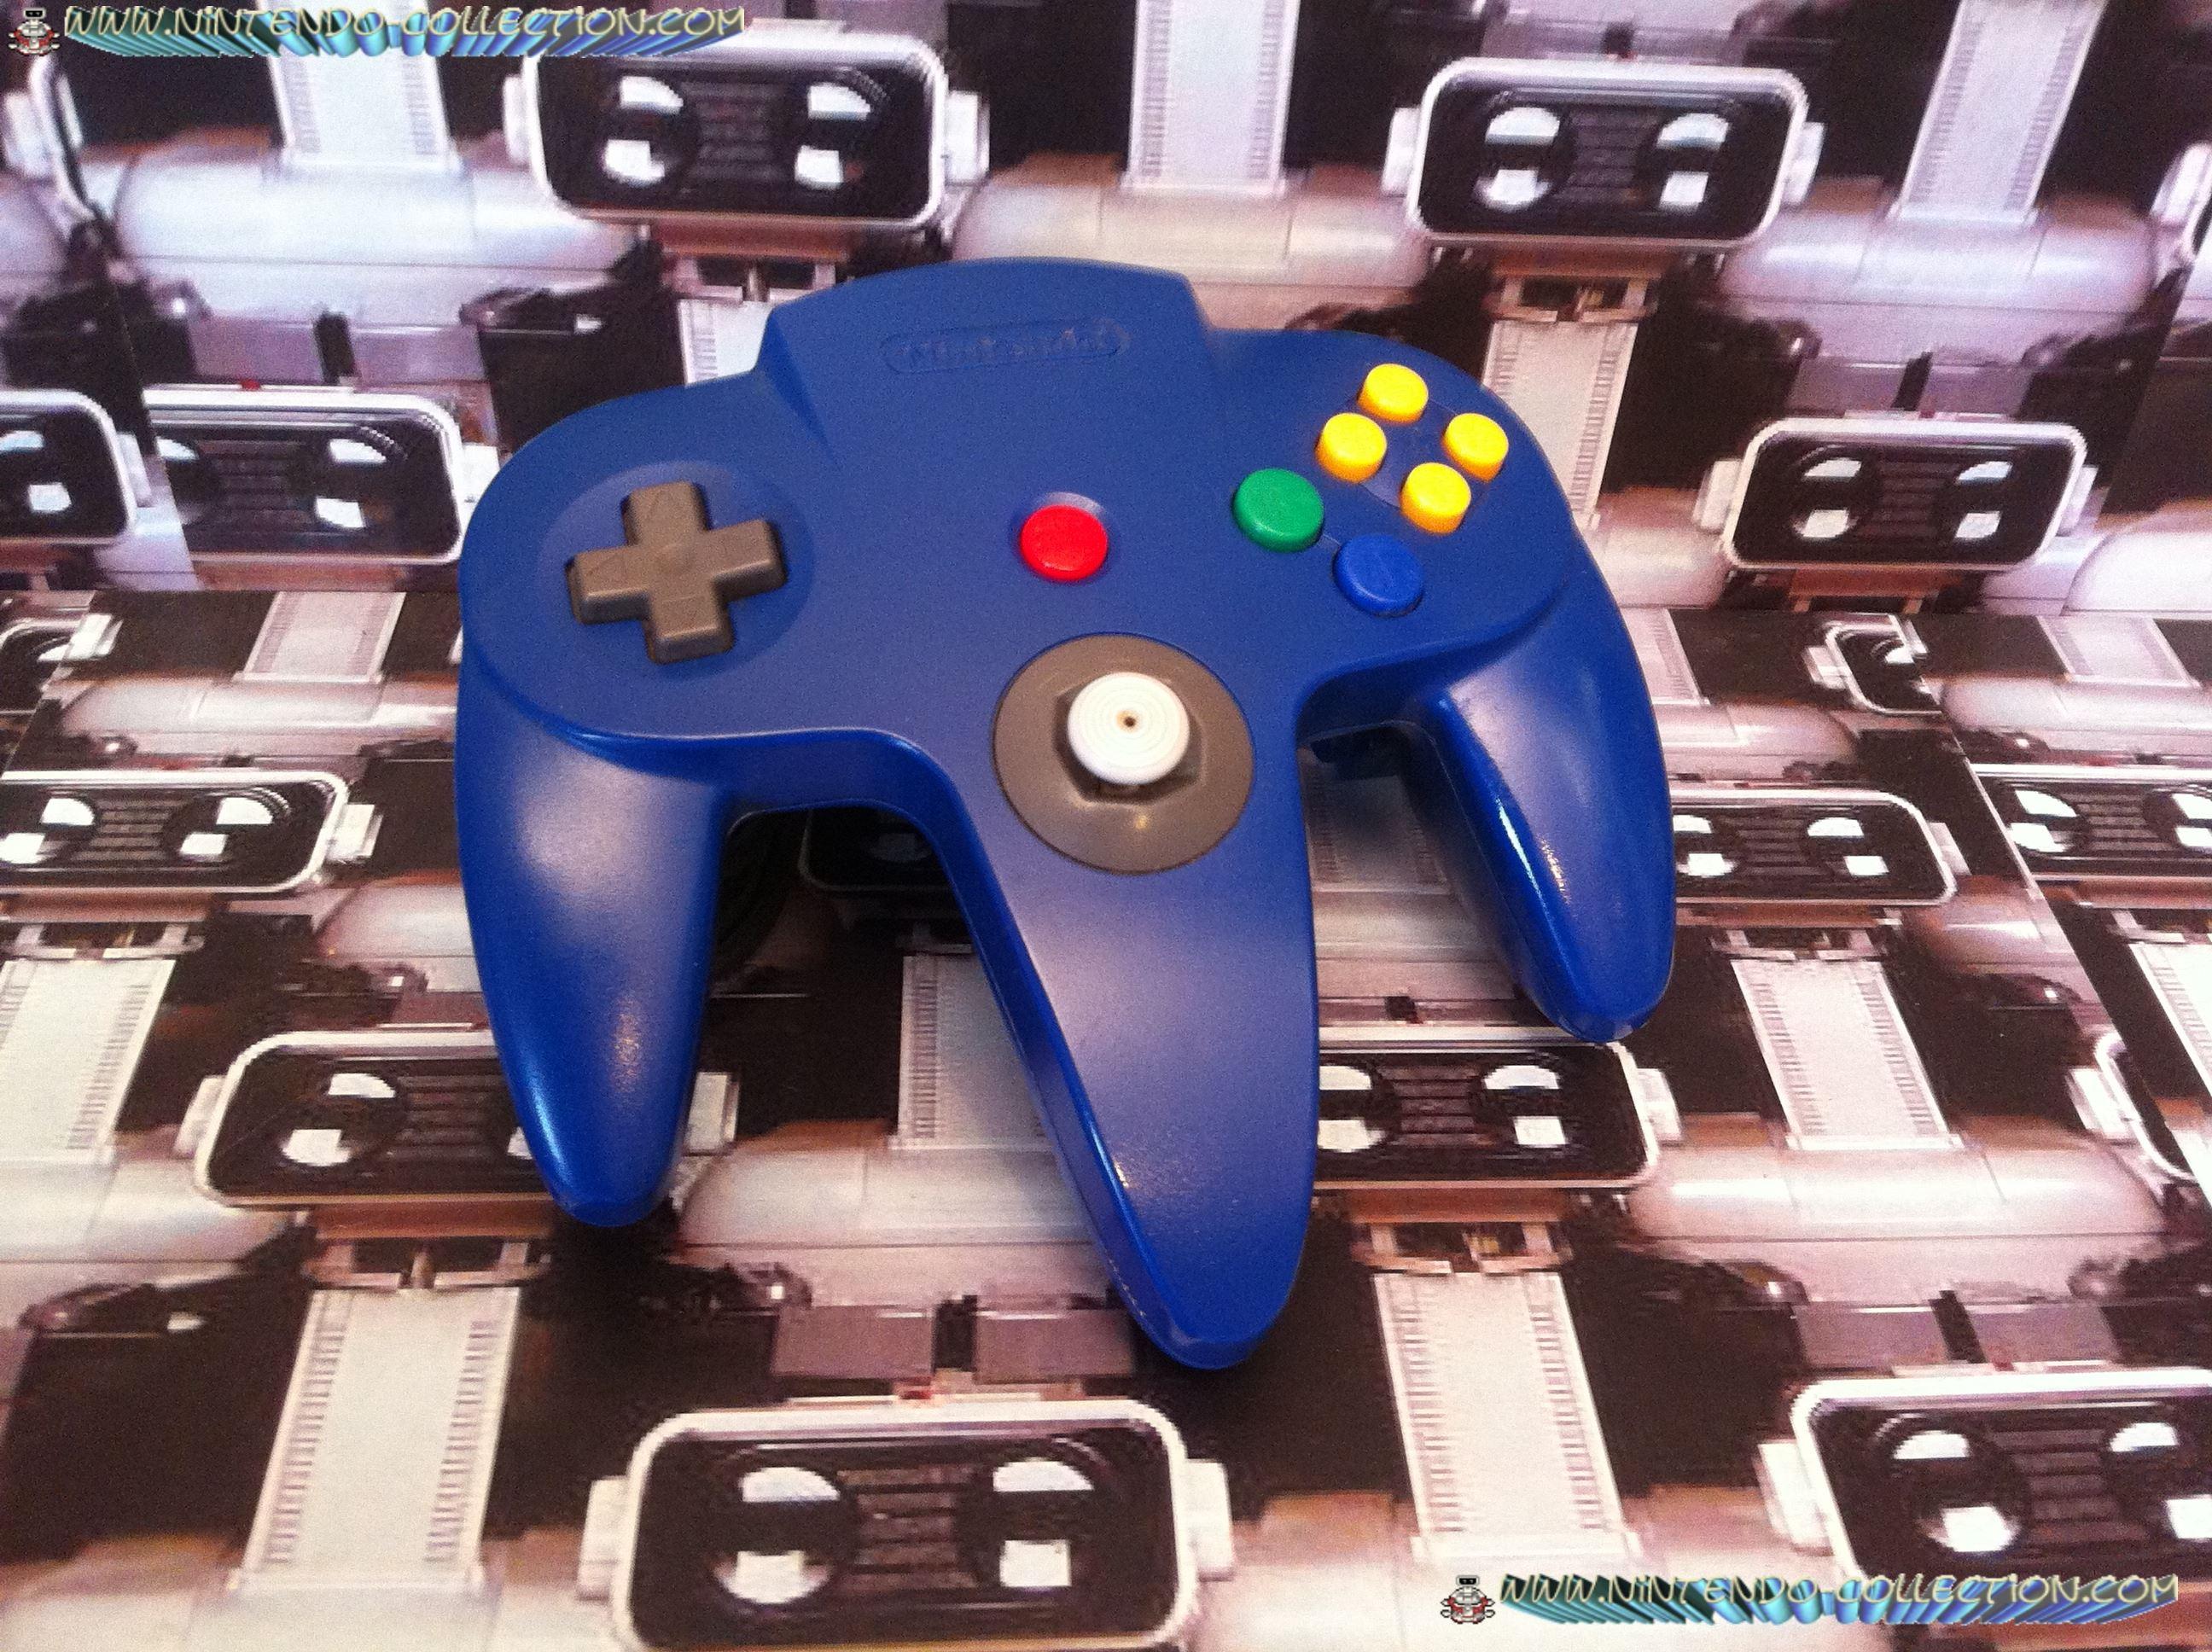 www.nintendo-collection.com  - Nintendo N64 Controller blue - Manette  bleue